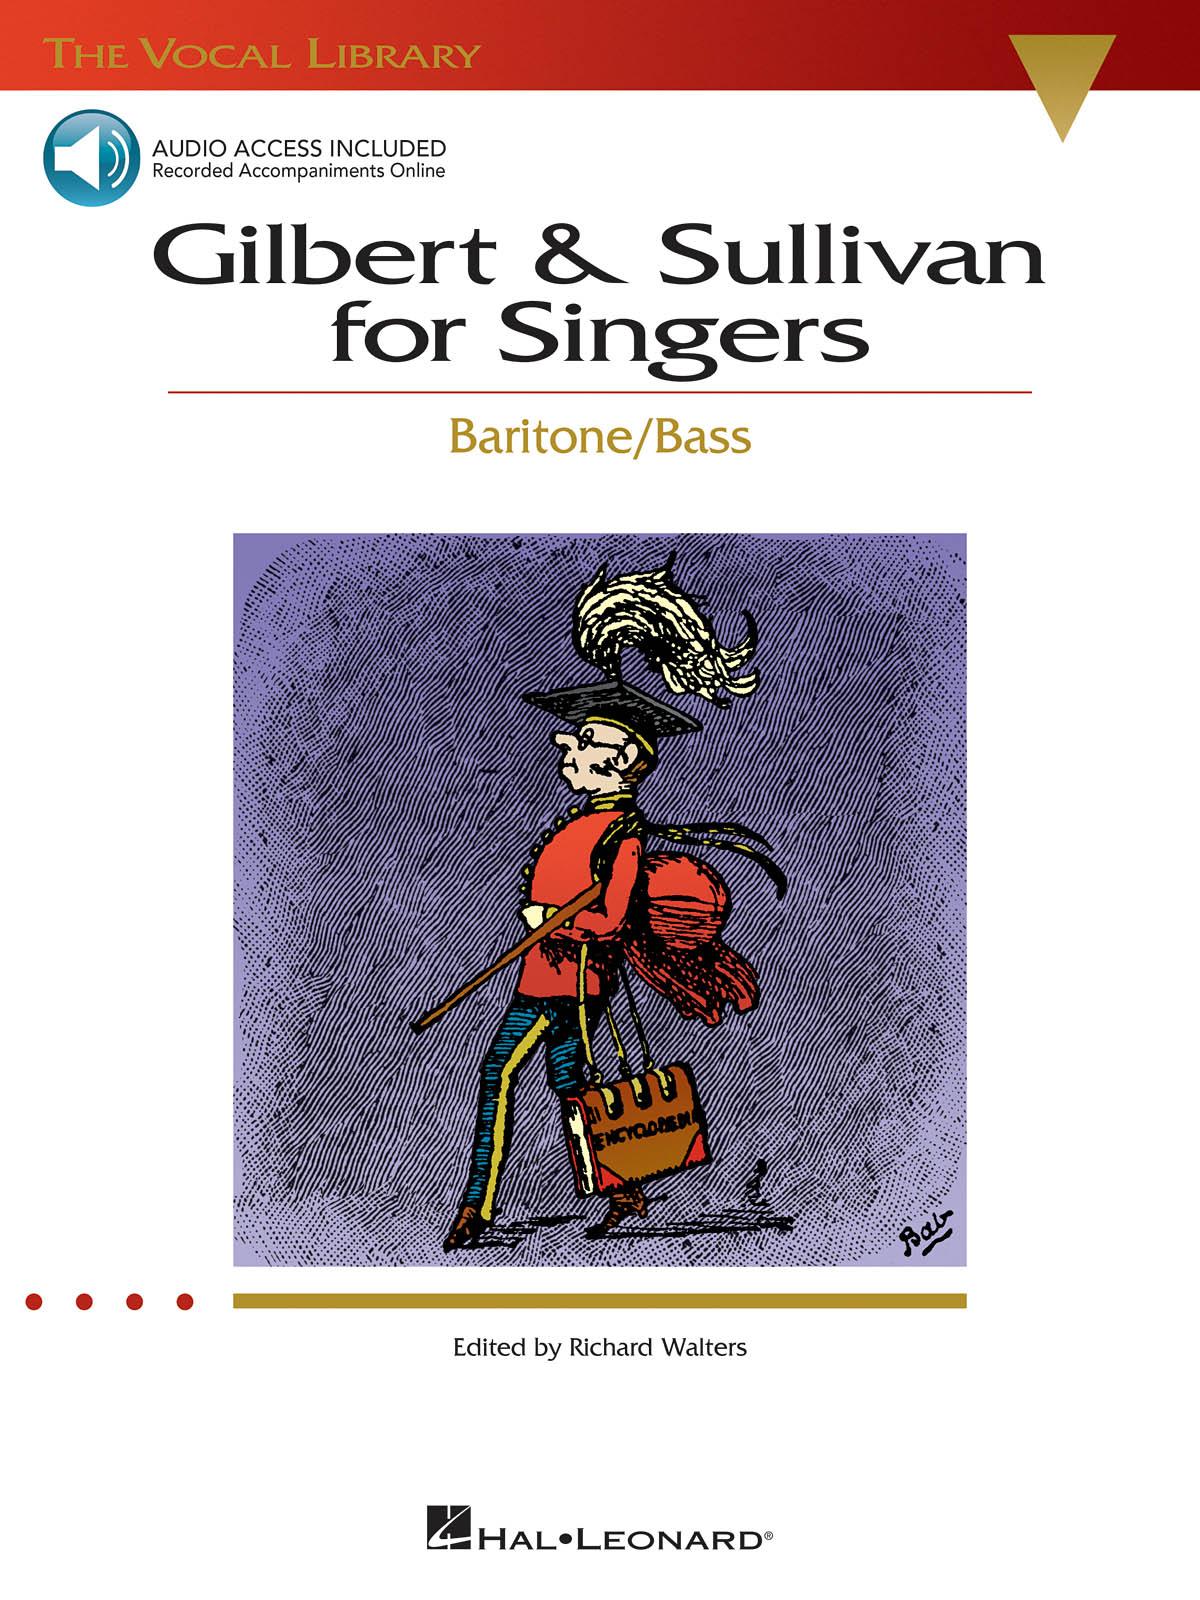 Arthur Sullivan William Schwenck Gilbert: Gilbert And Sullivan For Singers -